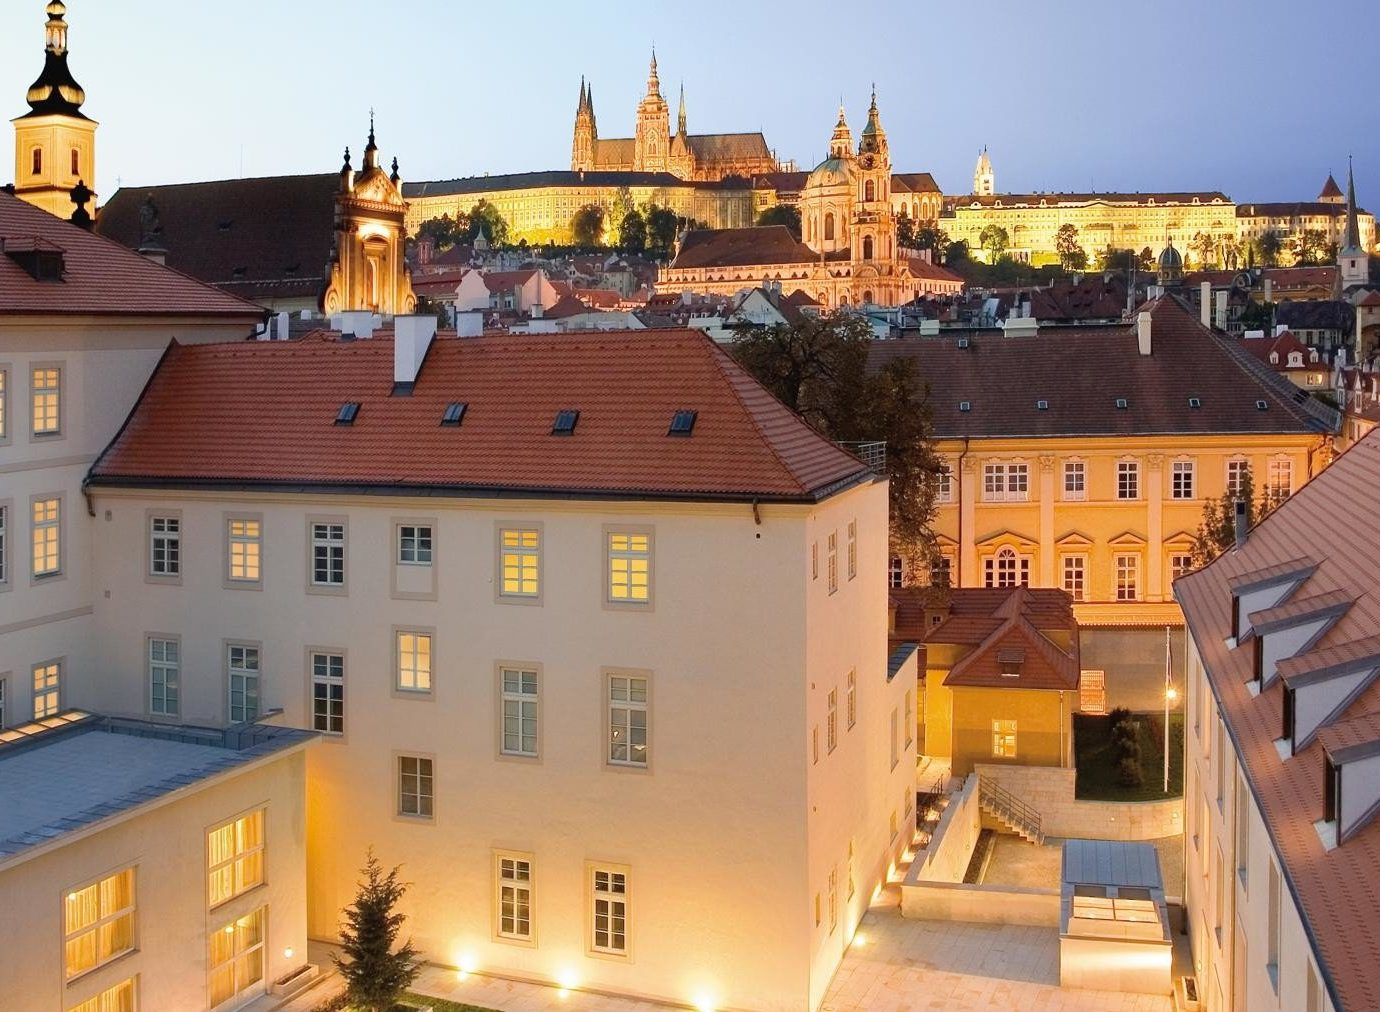 europe Hotels Prague Town landmark City historic site château building evening roof medieval architecture sky tourist attraction plaza facade town square tourism estate window cityscape palace